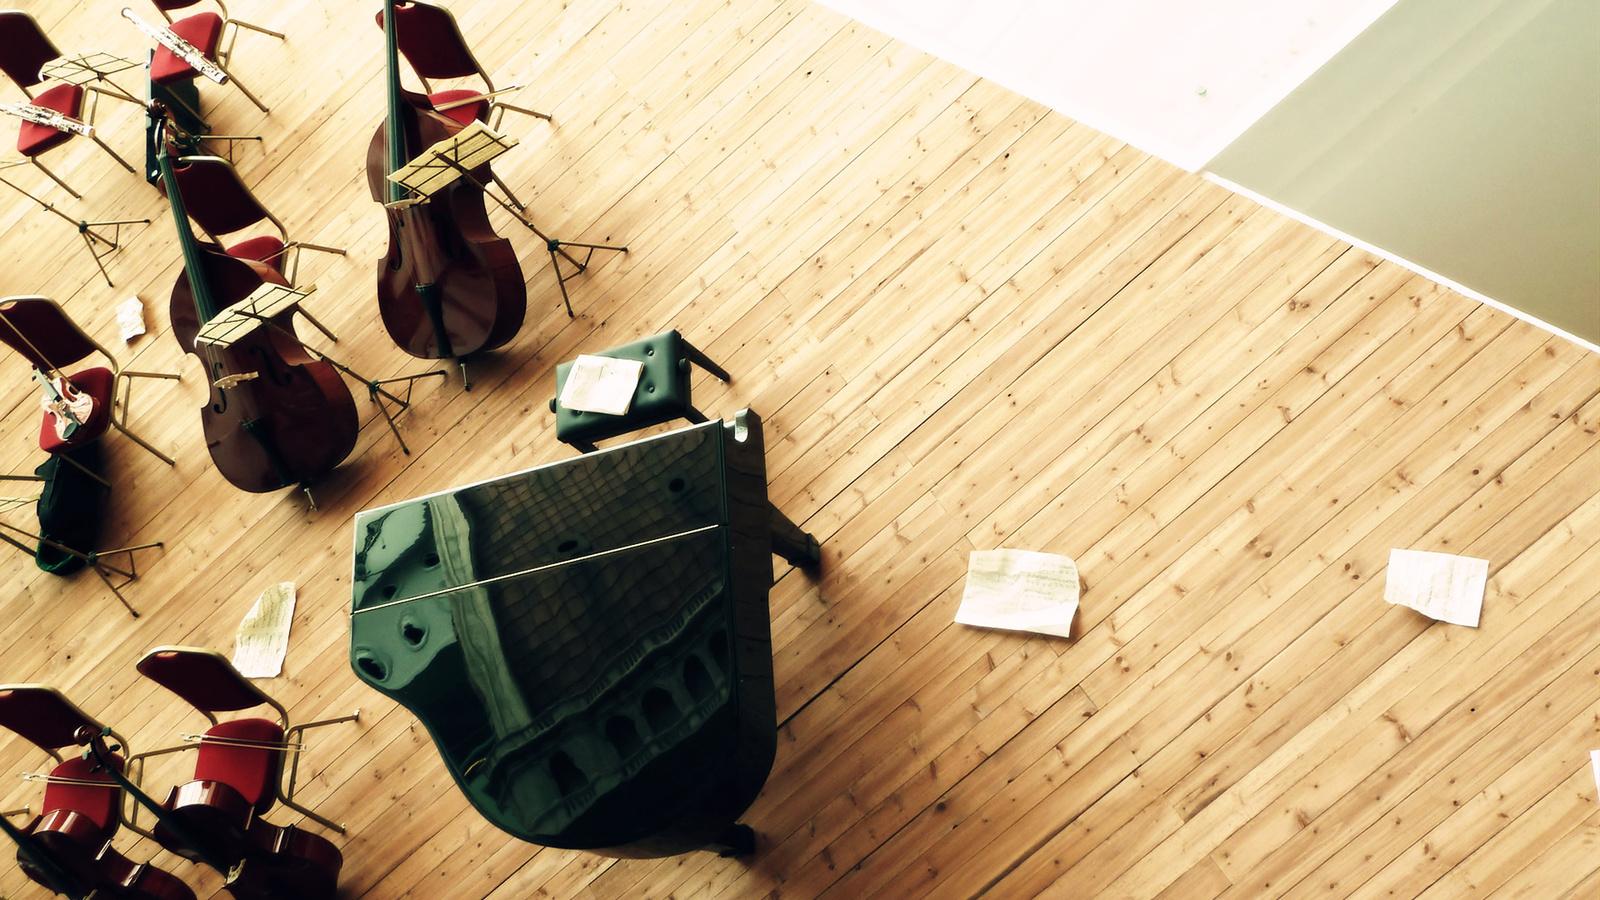 notes, orchestra, Symphony, piano, violin, musical, cello